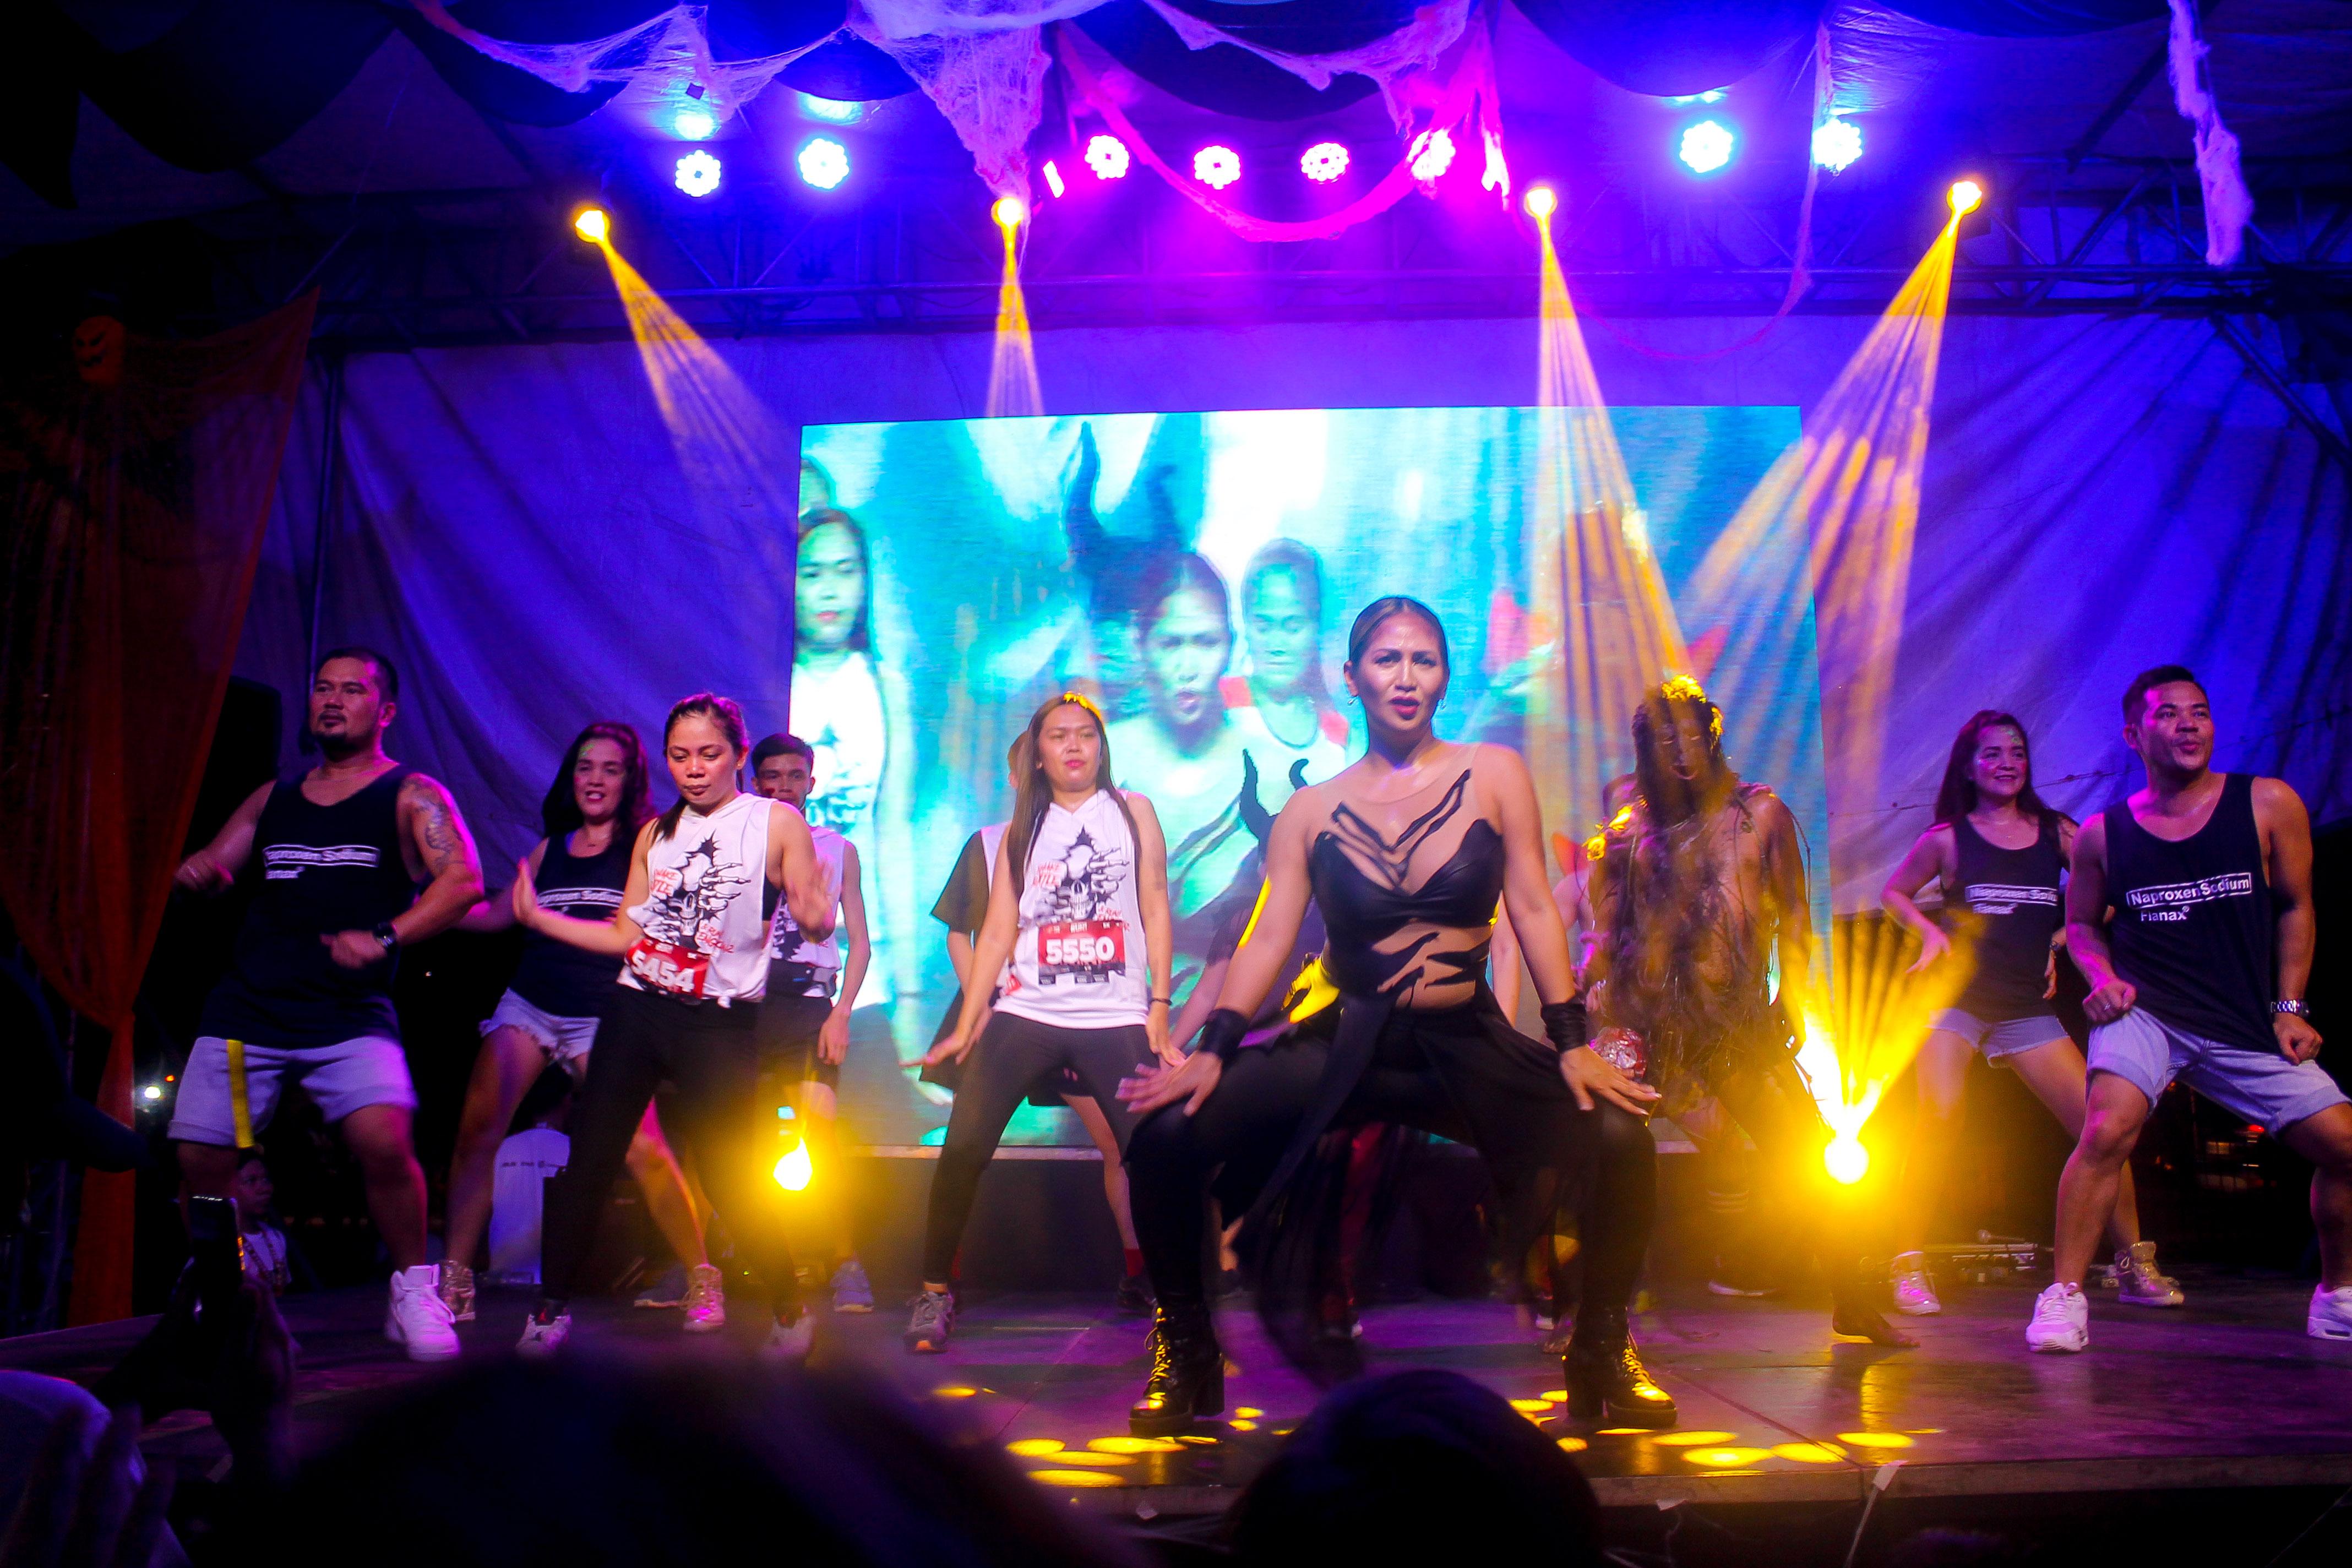 Ms. Regine Tolentino leading the Zombie Zumbathon.jpg